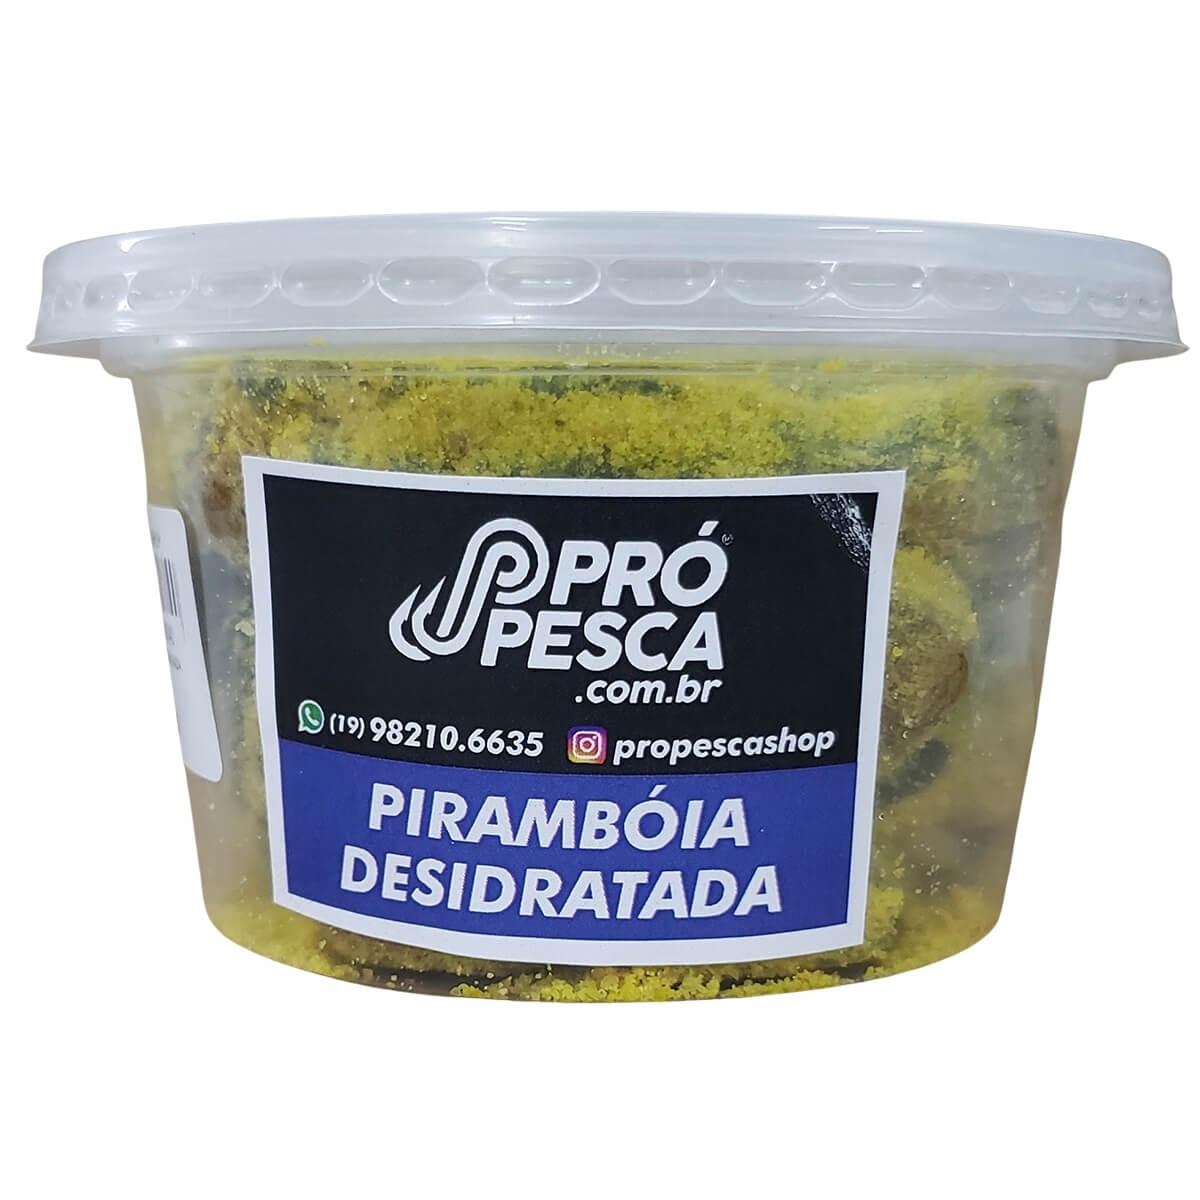 Isca para pesca Piramboia Desidratada  - Pró Pesca Shop